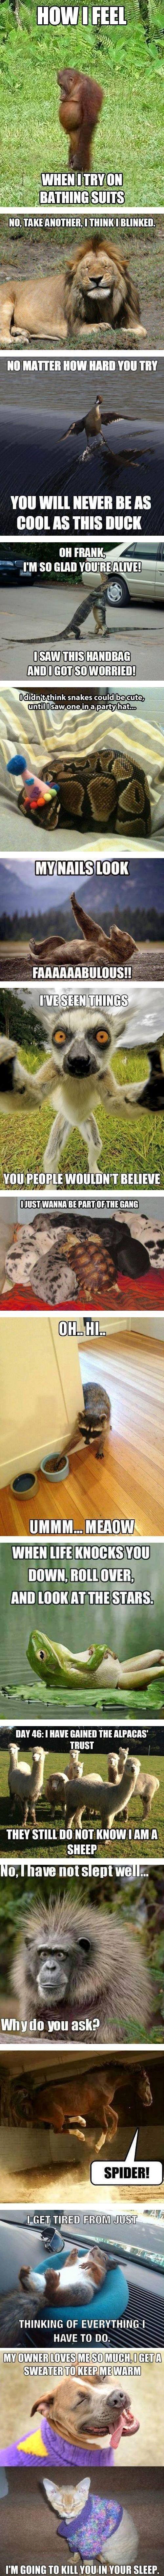 Funny Animal Memes ➣➢➣ http://www.diverint.com/memes-tumblr-ronda-de-chops-de-jonathan-viera